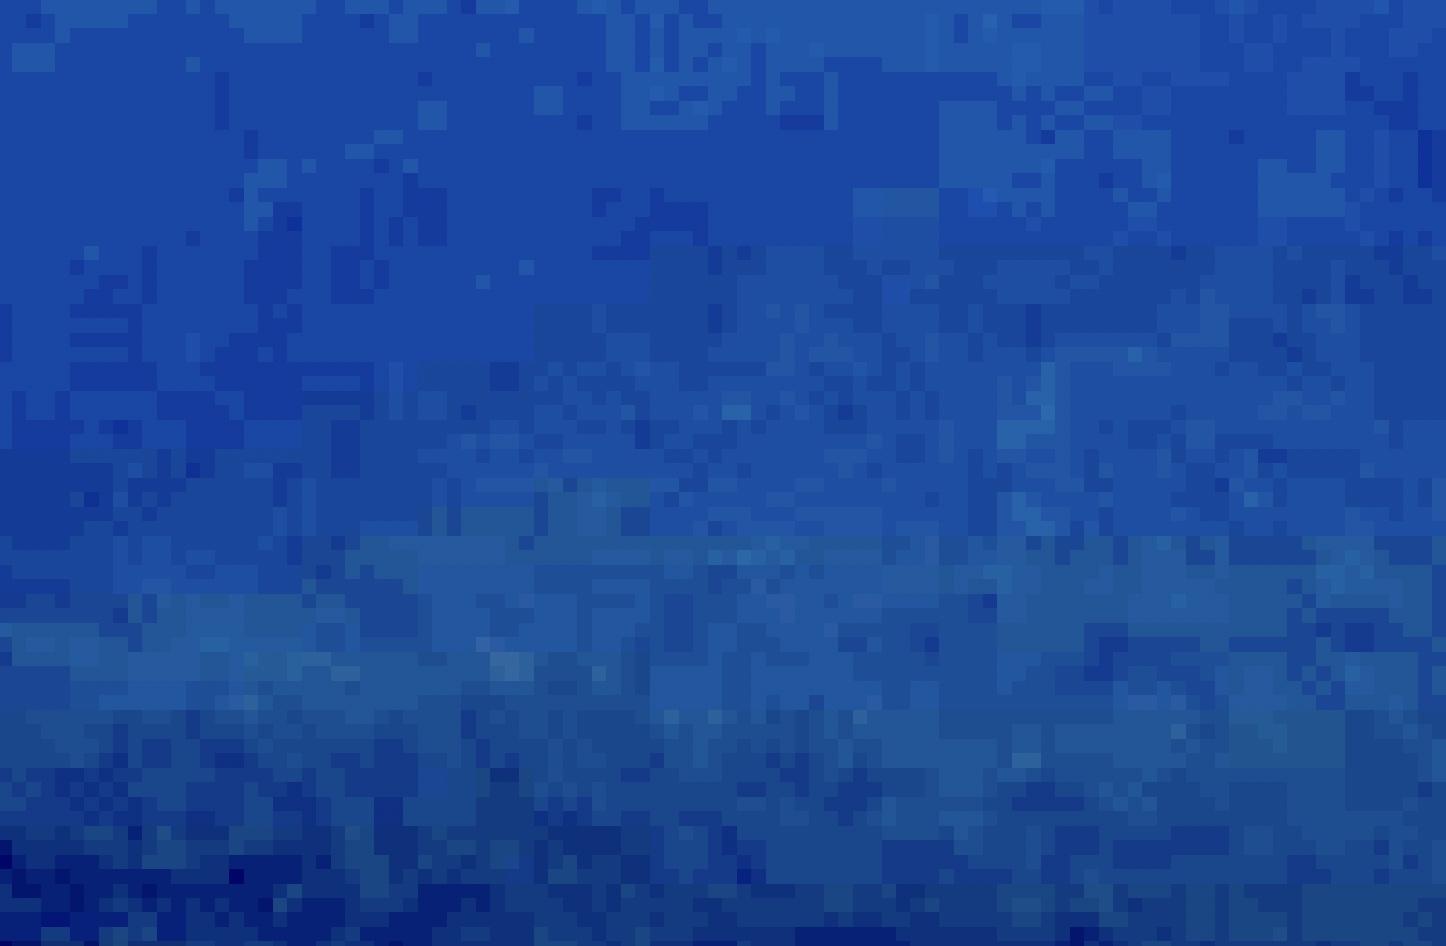 Metabunk 2019-01-28 07-39-05.jpg